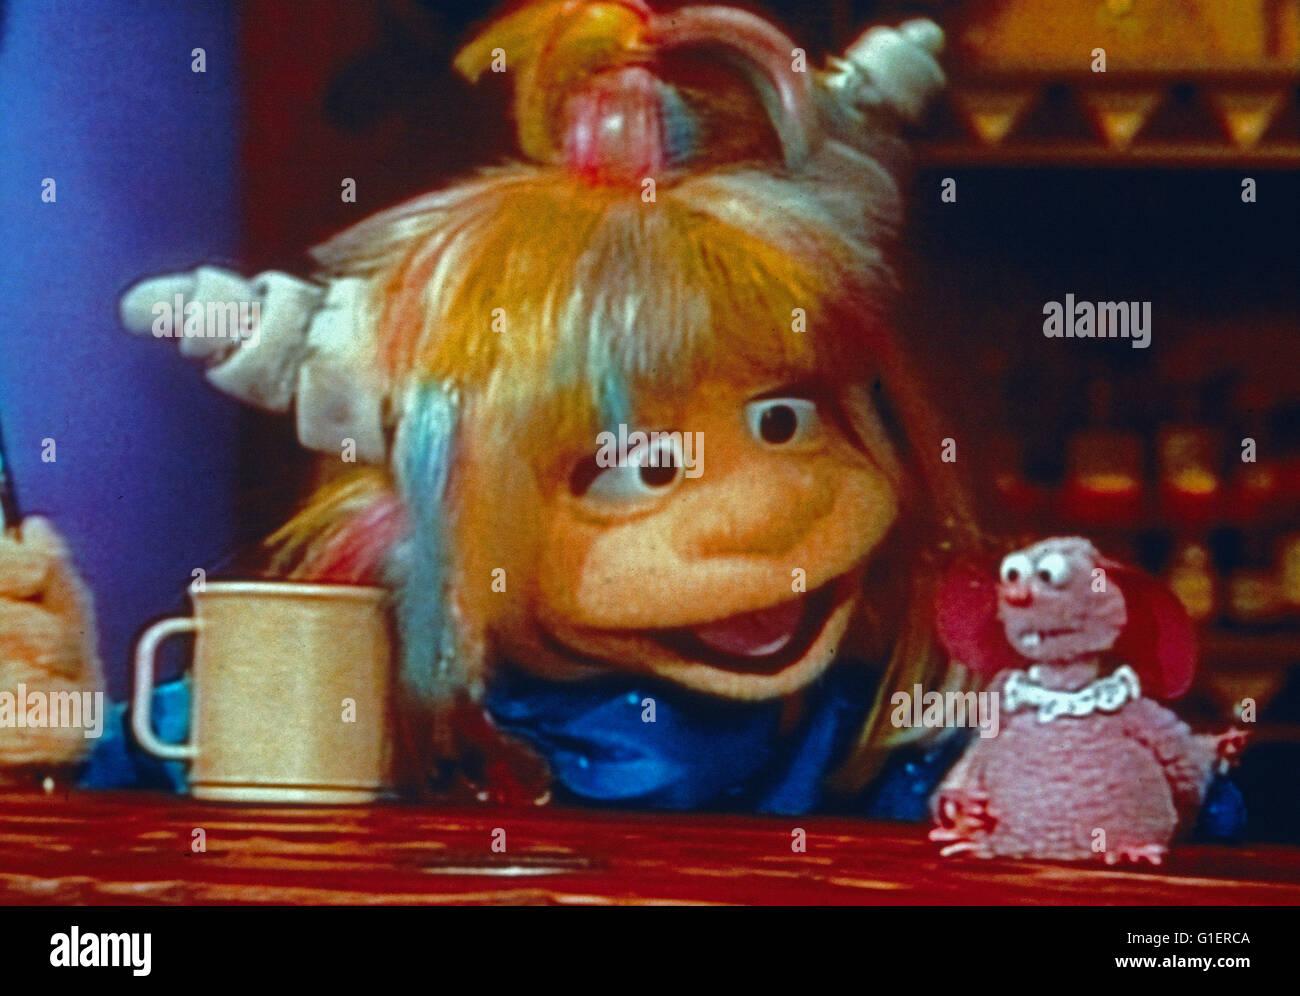 Eureeka do Castelo, aka: Walburgas Zauberschloss, Puppentrickserie, EUA 1989, Charakter: Walburga encarregou Imagens de Stock